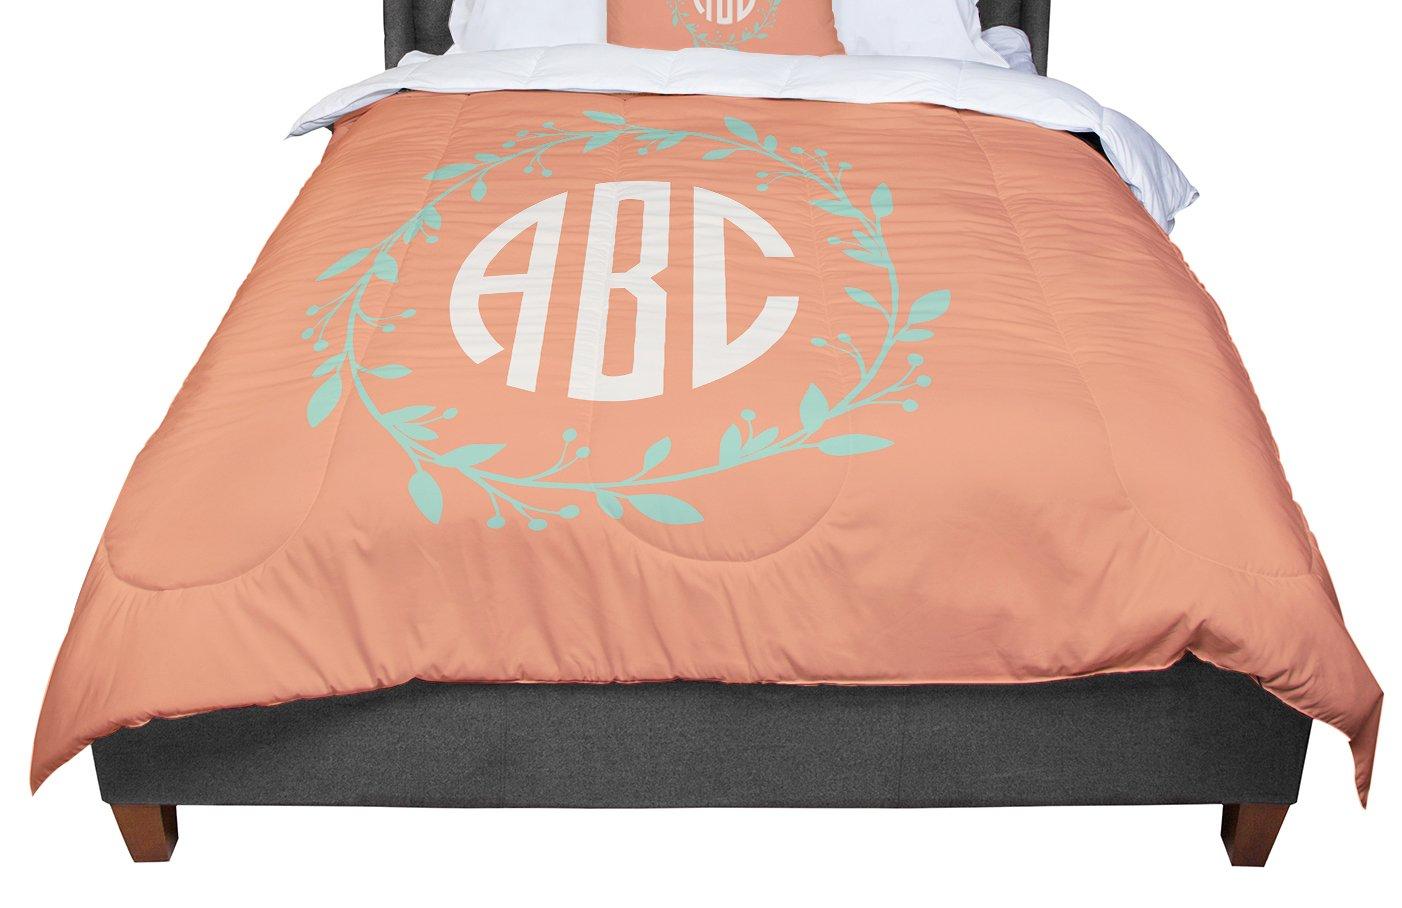 Cal King Comforter KESS InHouse KESS Original Classic Orange Wreath Monogram Green Illustration King 104 X 88